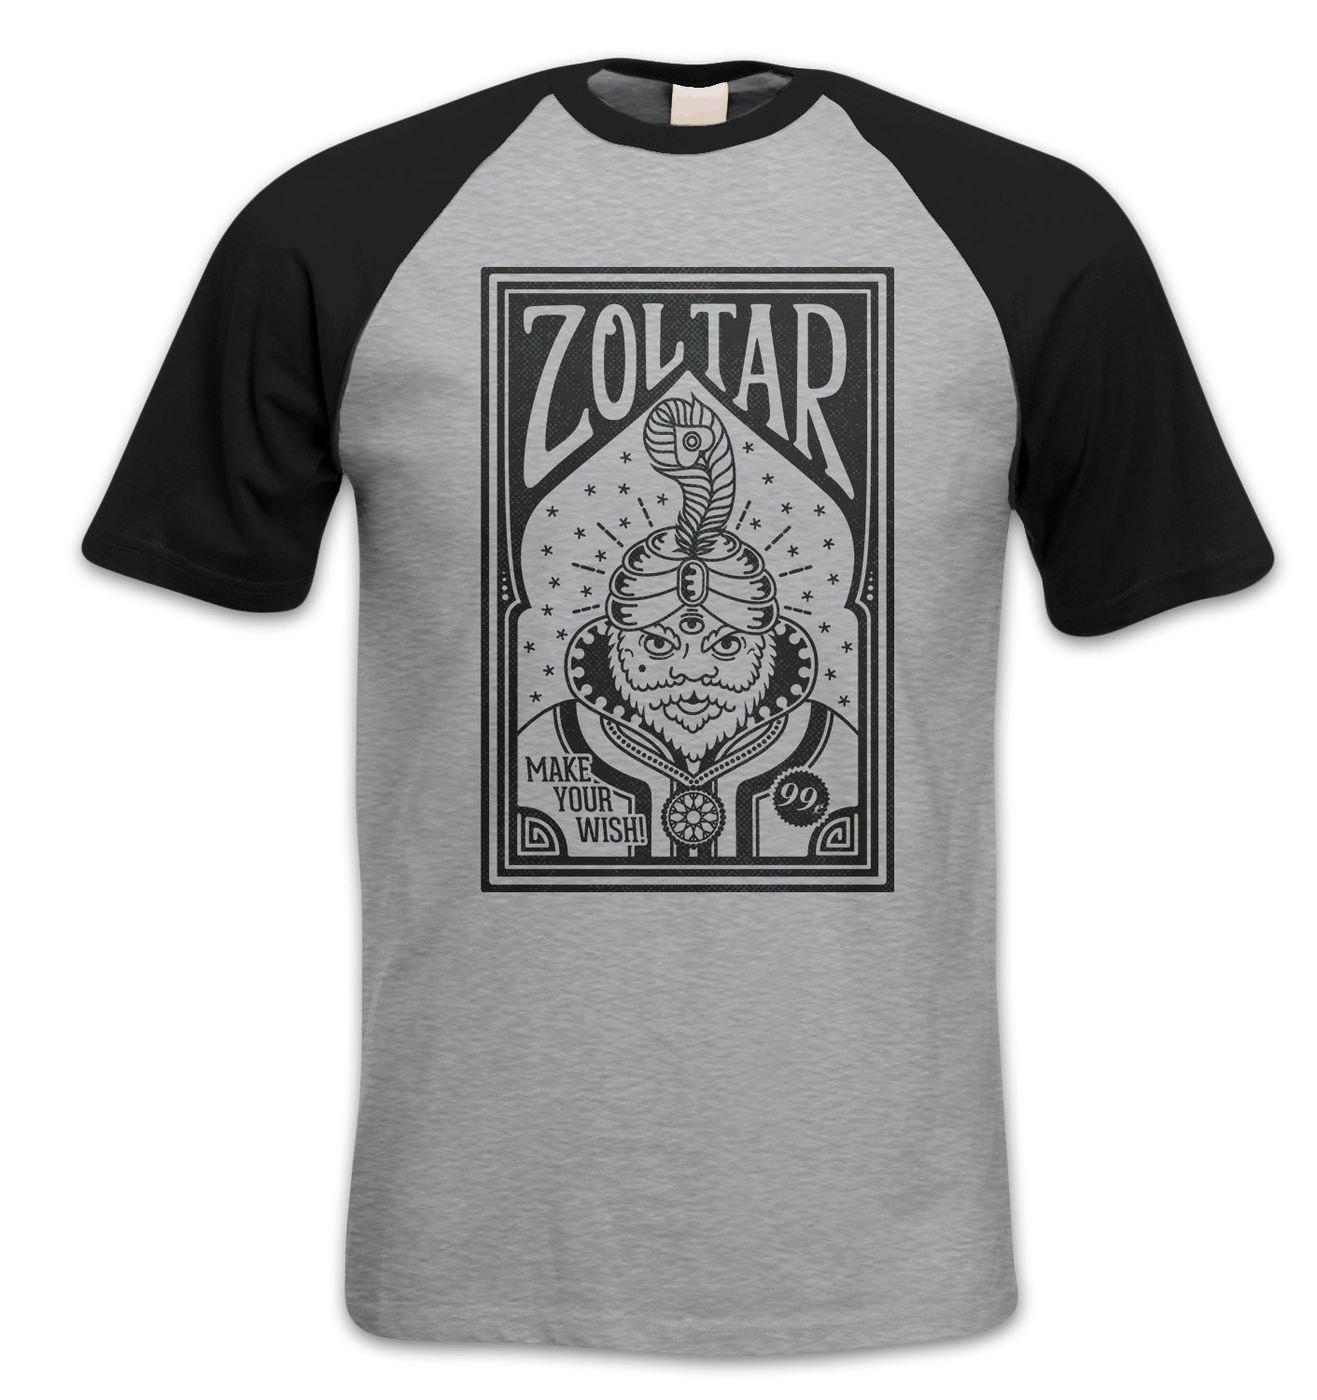 Retro Zoltar short sleeve baseball t-shirt by Something Geeky